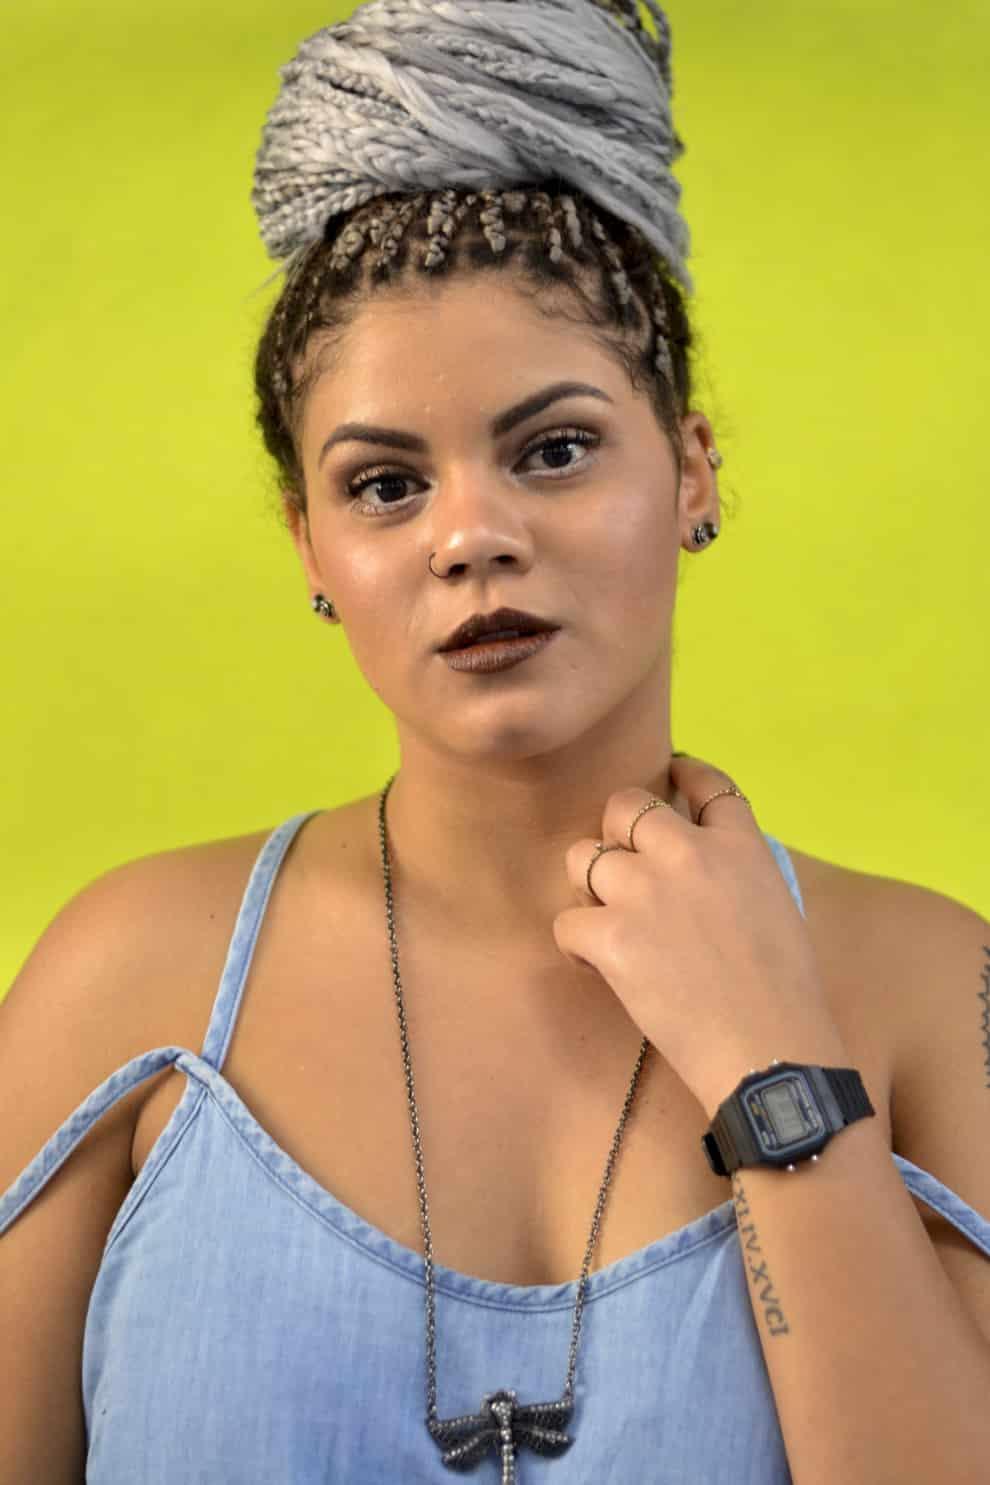 Jessyca Alves